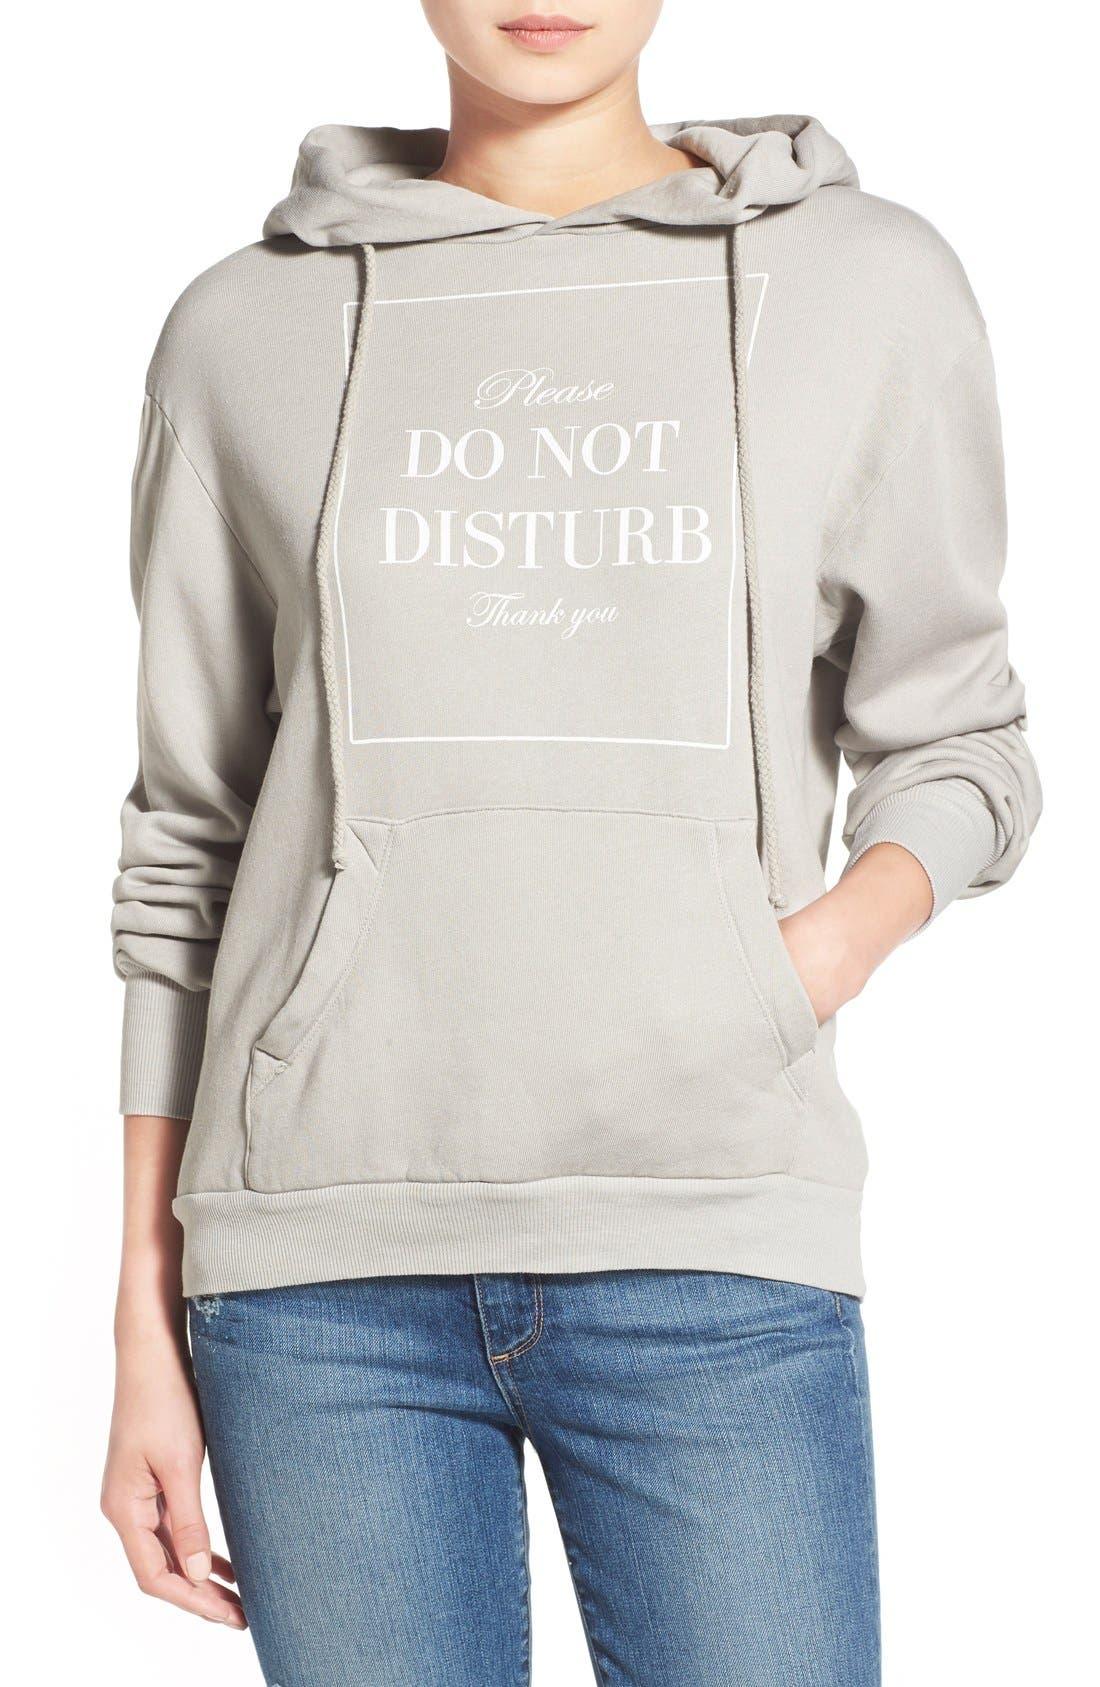 'Please Do Not Disturb' Hooded Sweatshirt,                             Main thumbnail 1, color,                             060